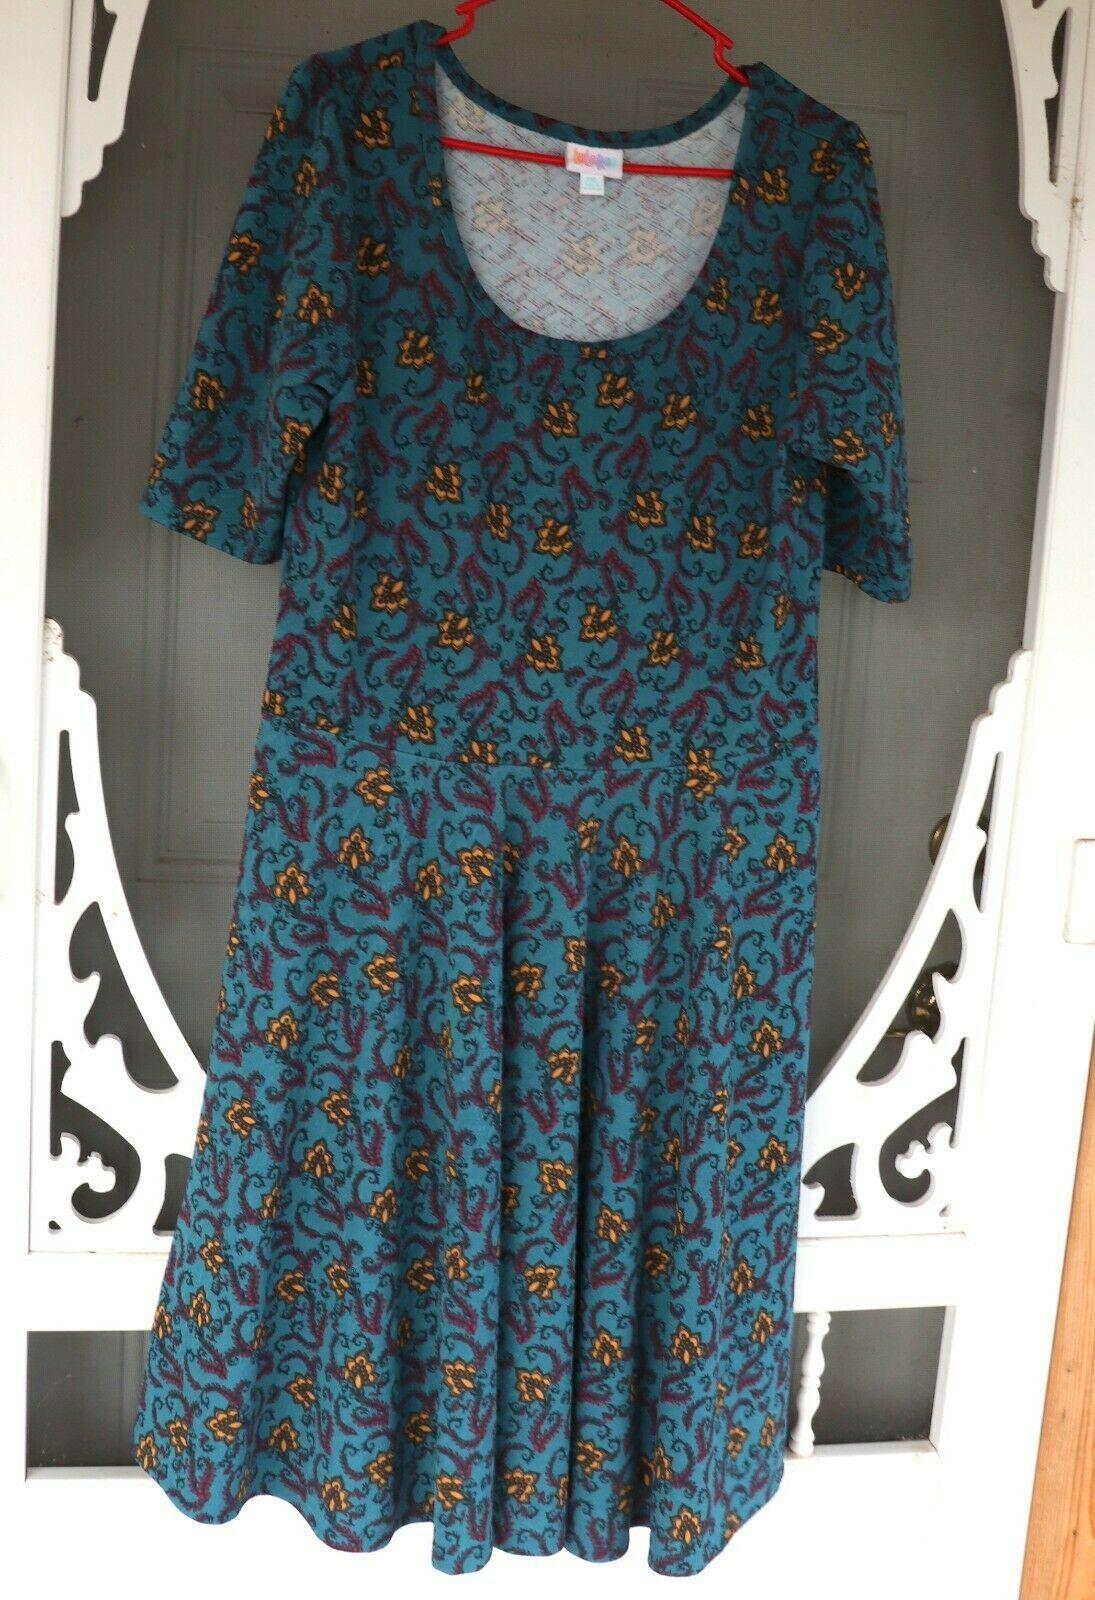 LulaRoe Teal Floral Print dress